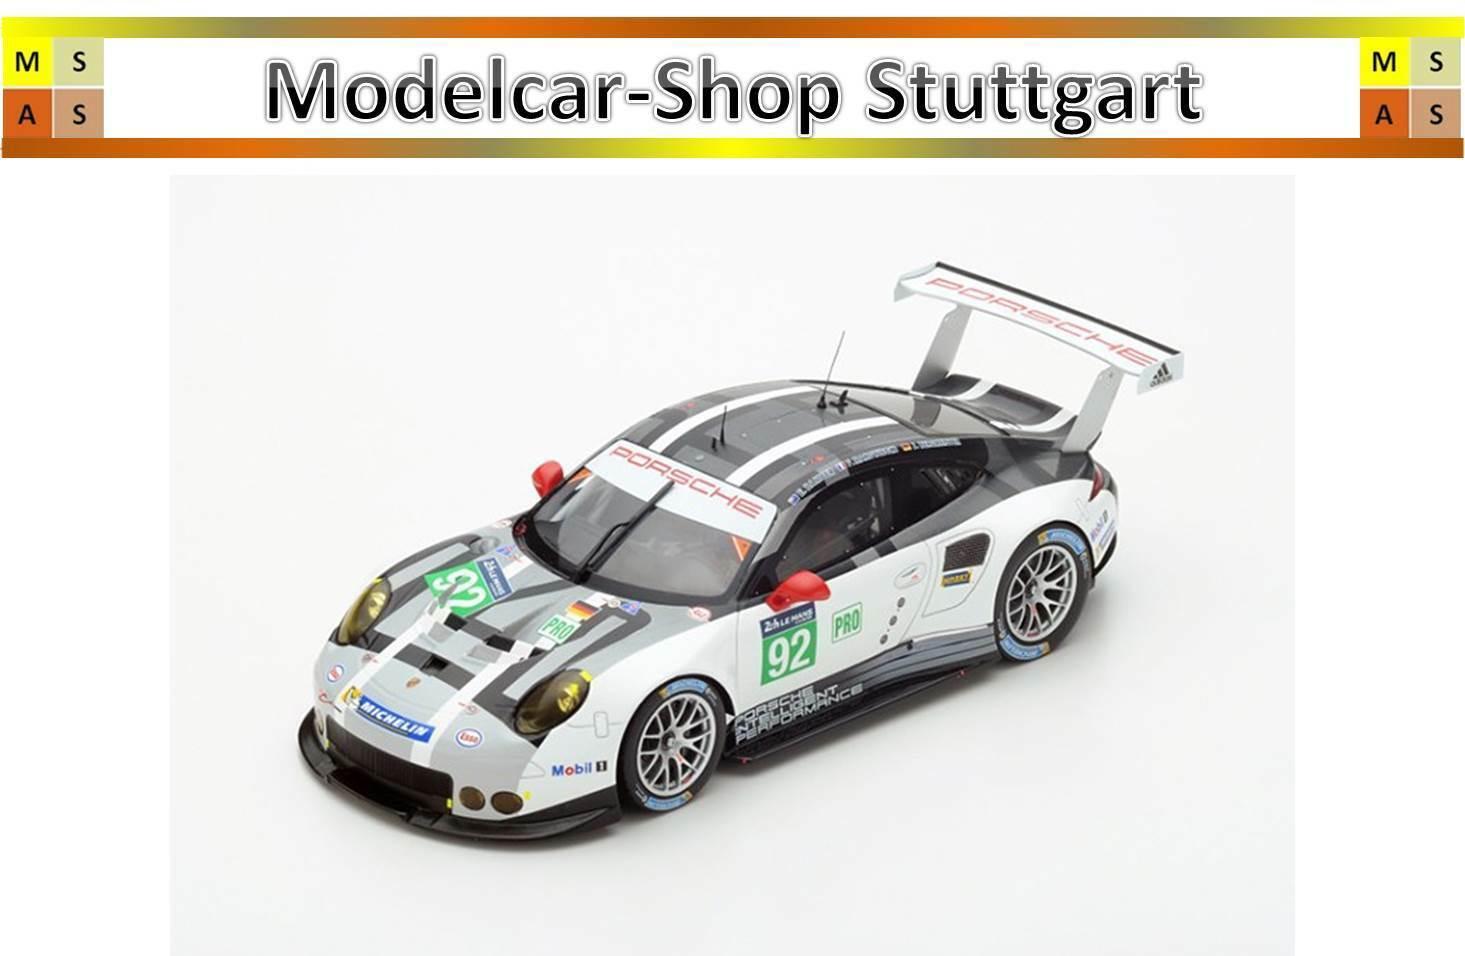 Porsche 911 Rsr le Mans 2015 - Spark 1 43 - Map02087715 - Brand New